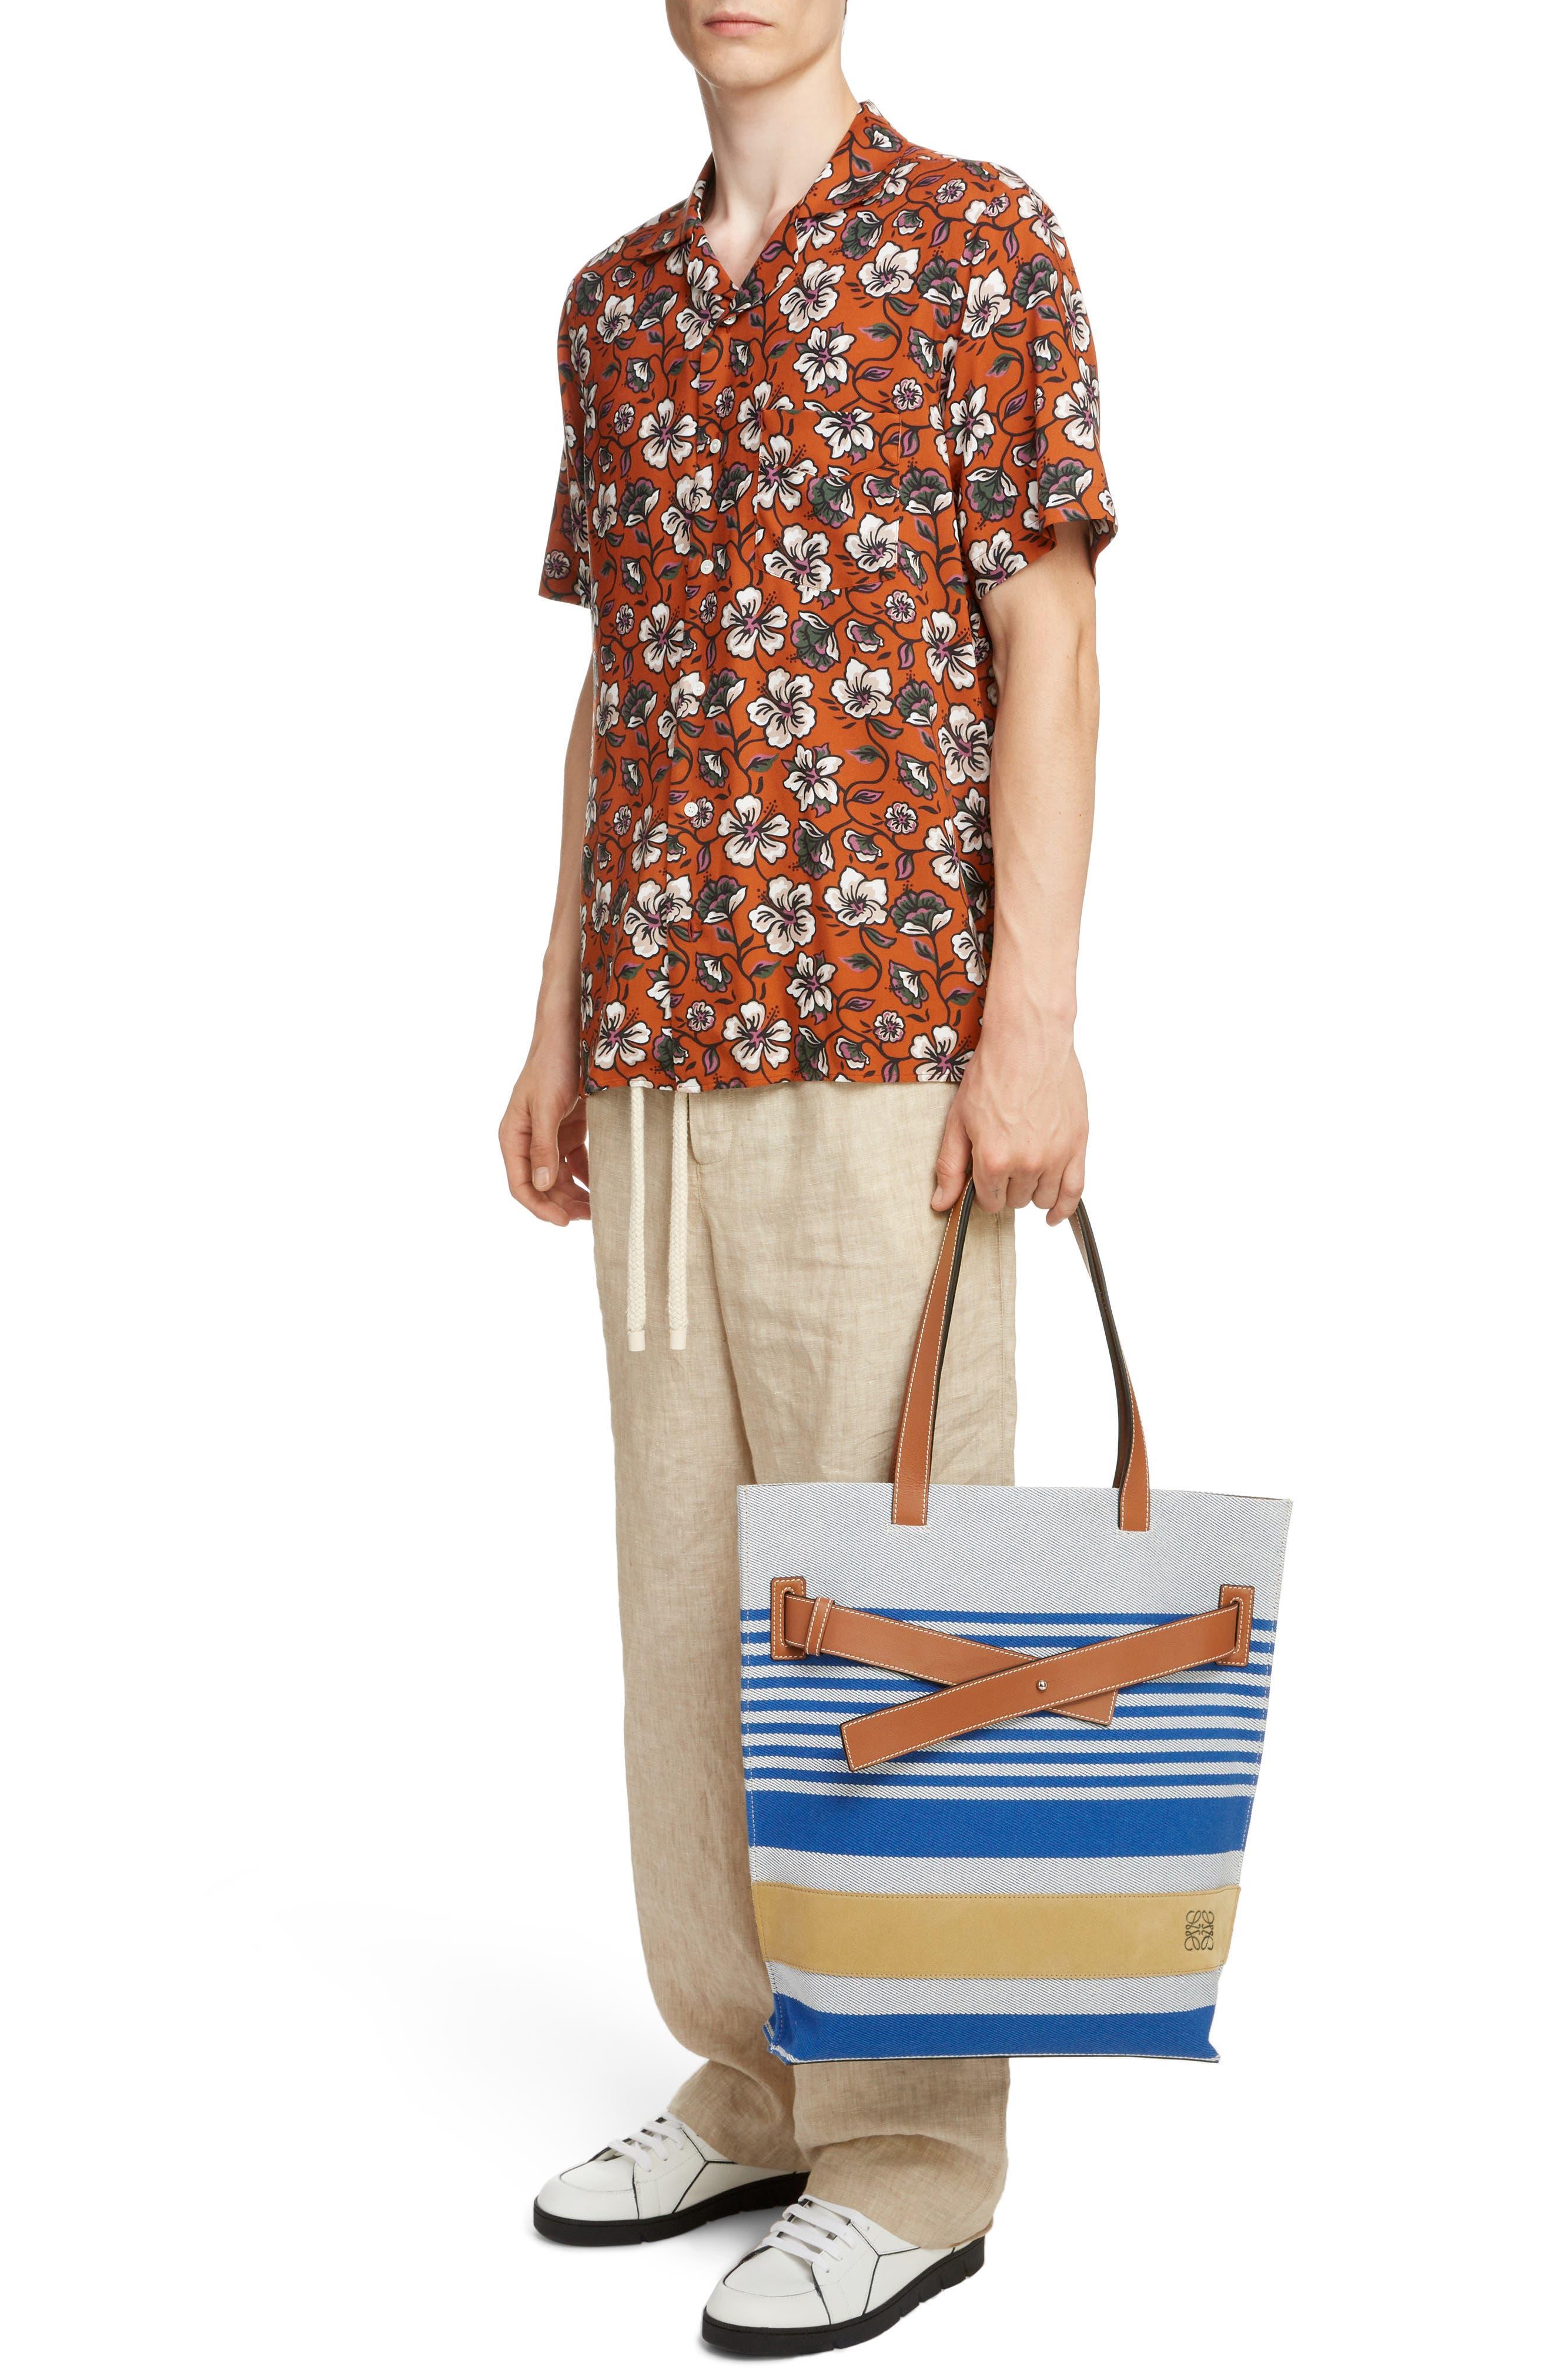 LOEWE, Stripe Twill Tote Bag, Alternate thumbnail 2, color, PACIFIC BLUE/MULTICOLOR